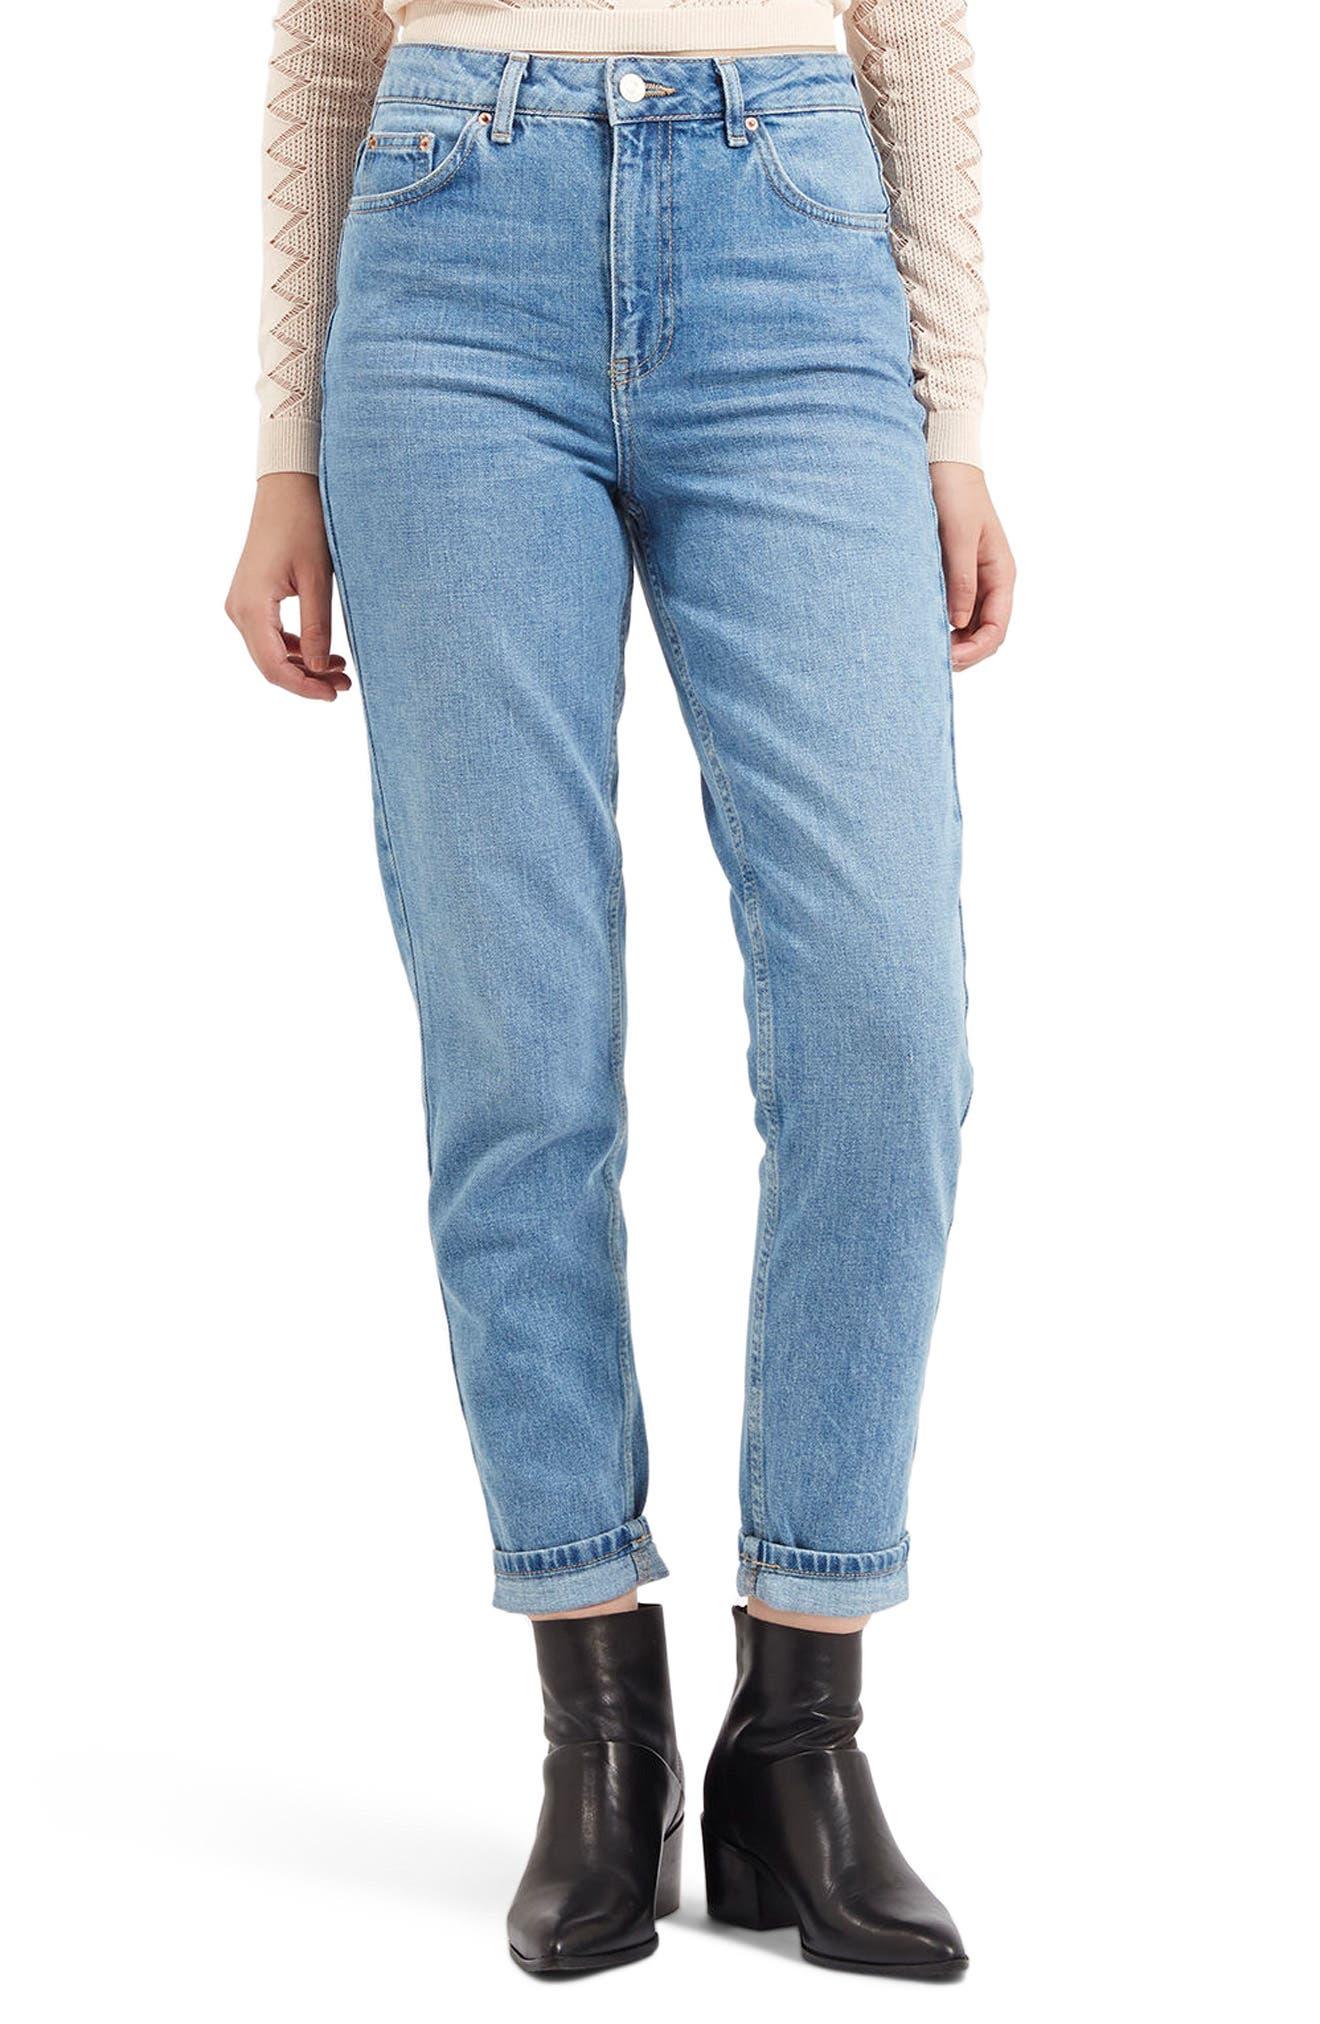 TOPSHOP, Light Denim Mom Jeans, Main thumbnail 1, color, LIGHT DENIM